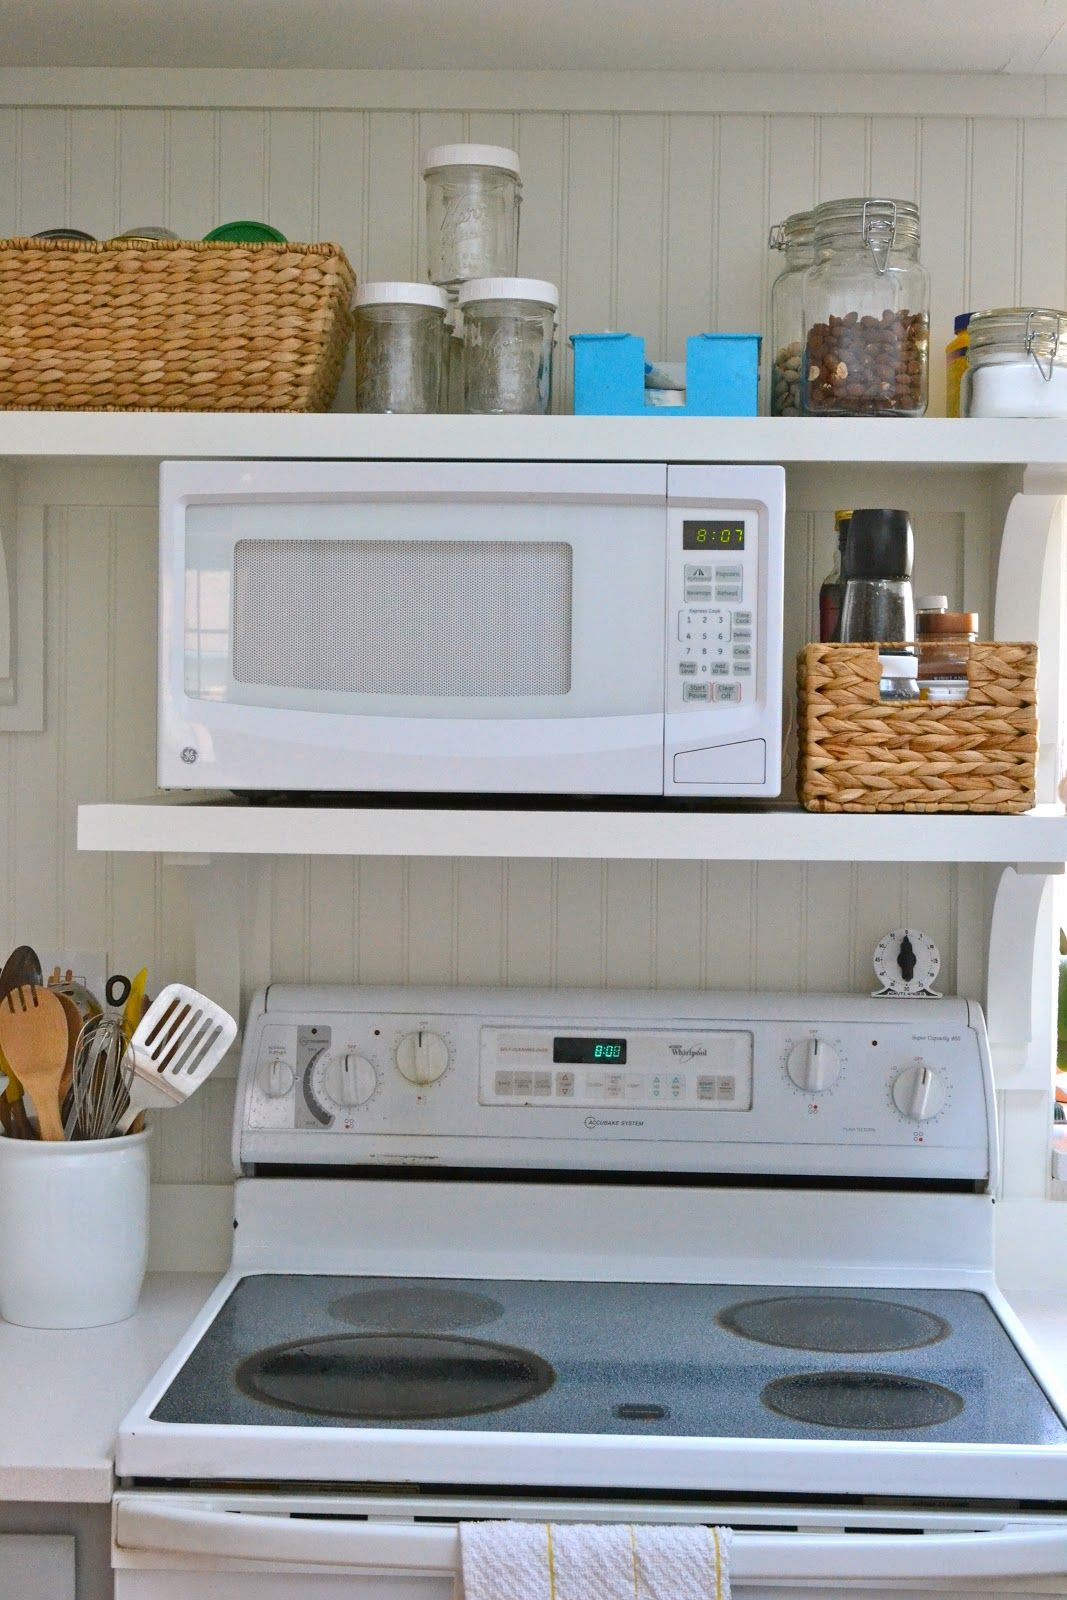 microwave shelf over stove kitchen design